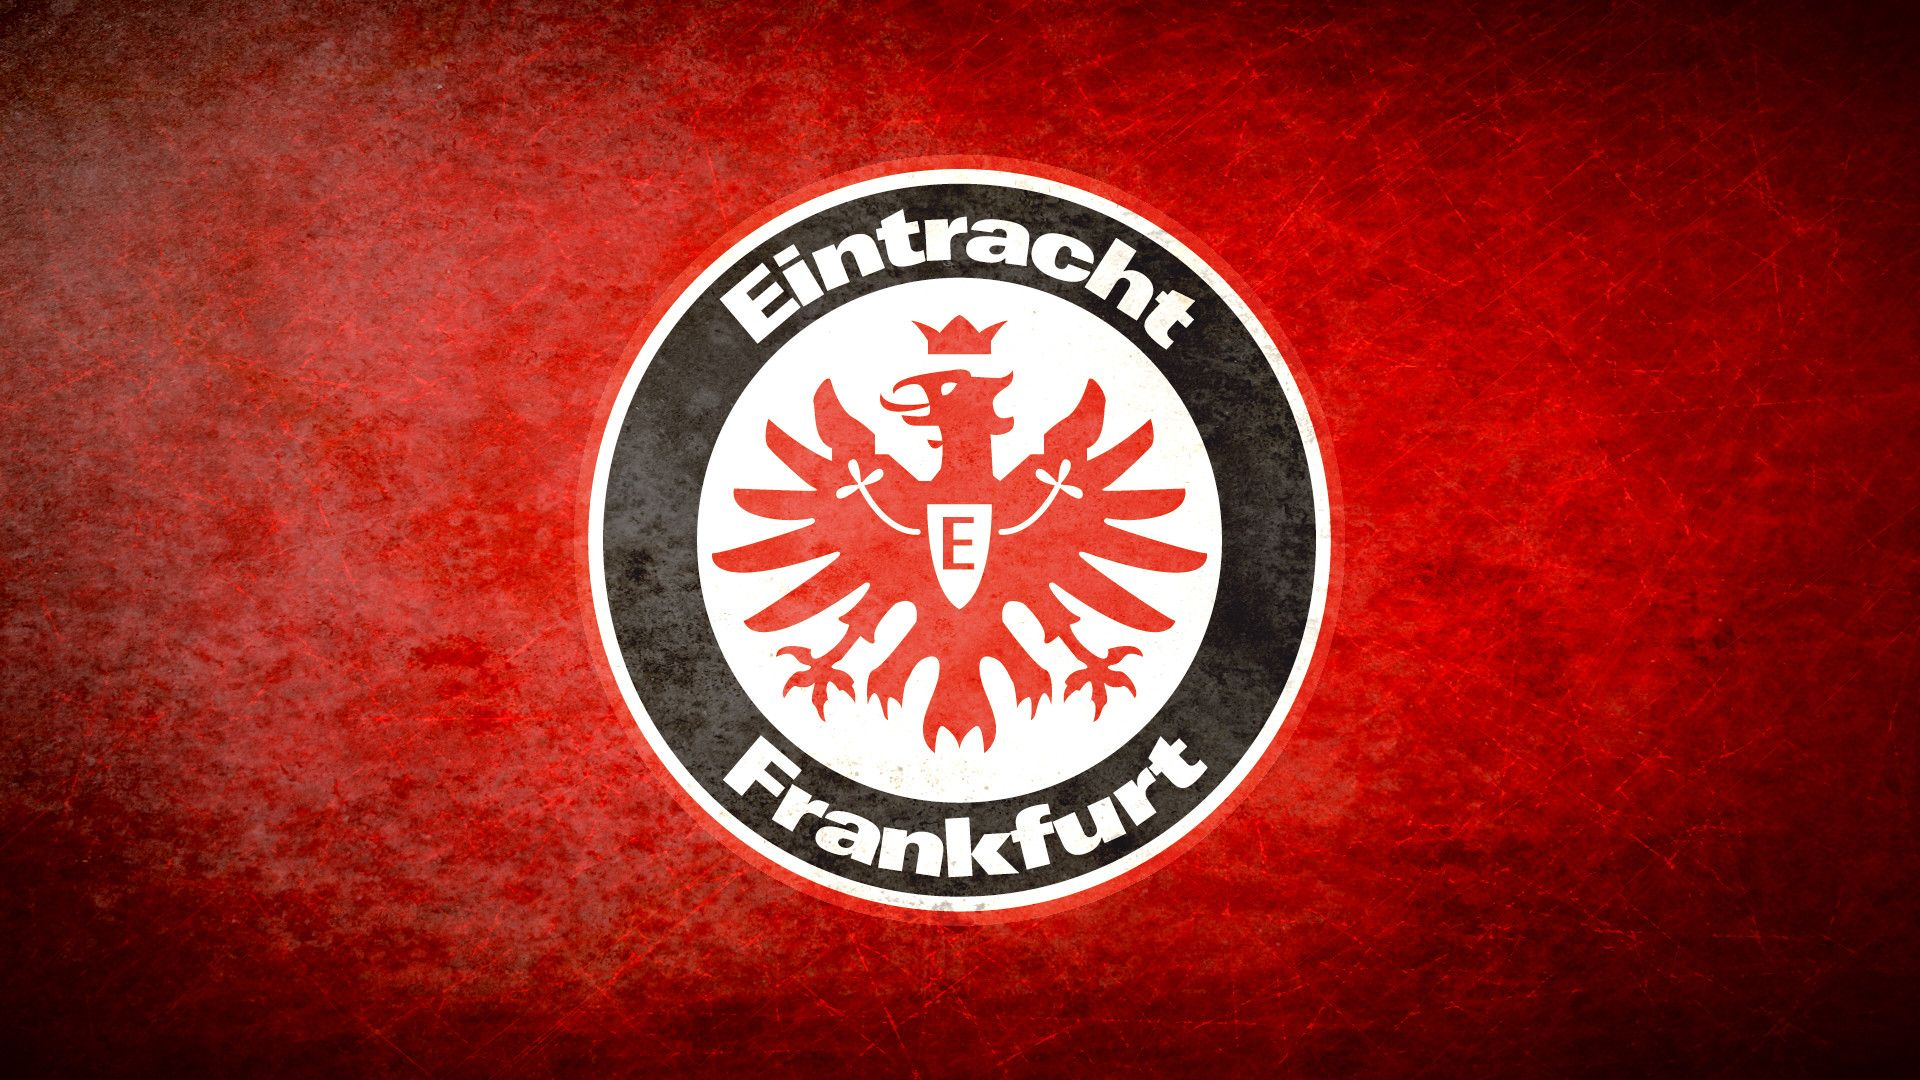 Eintracht Frankfurt Fc